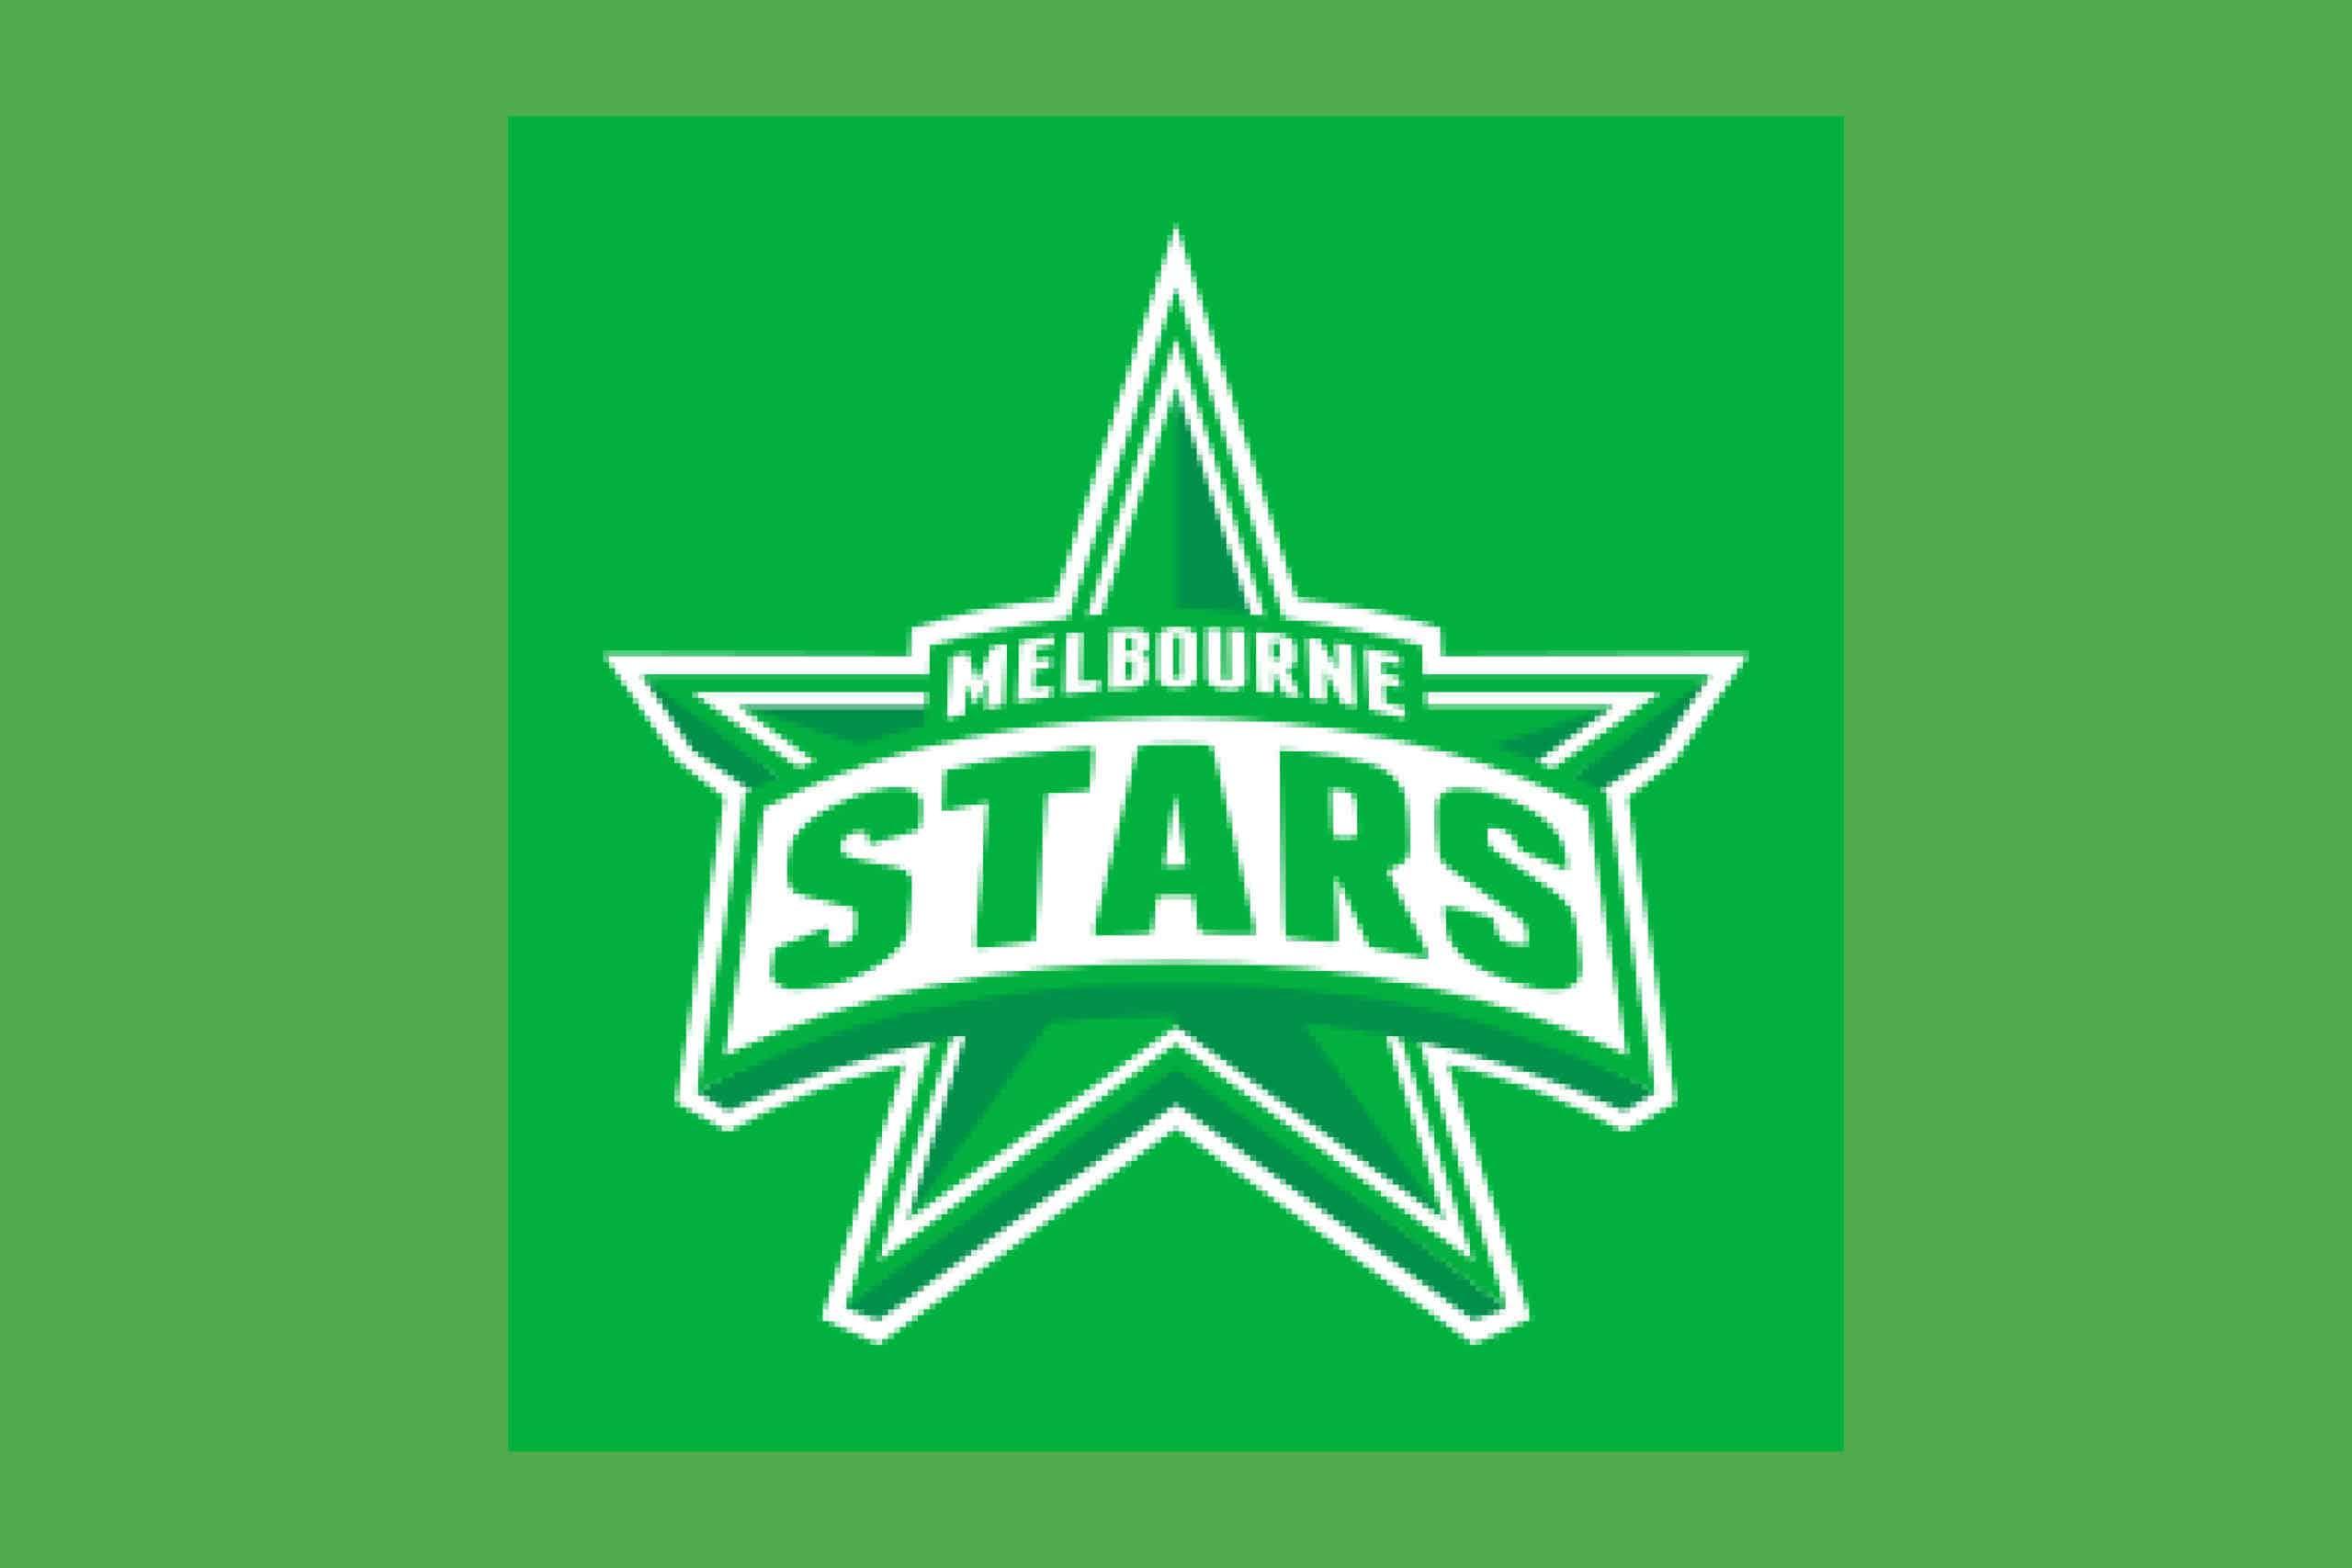 Melbourne stars Cricket Team